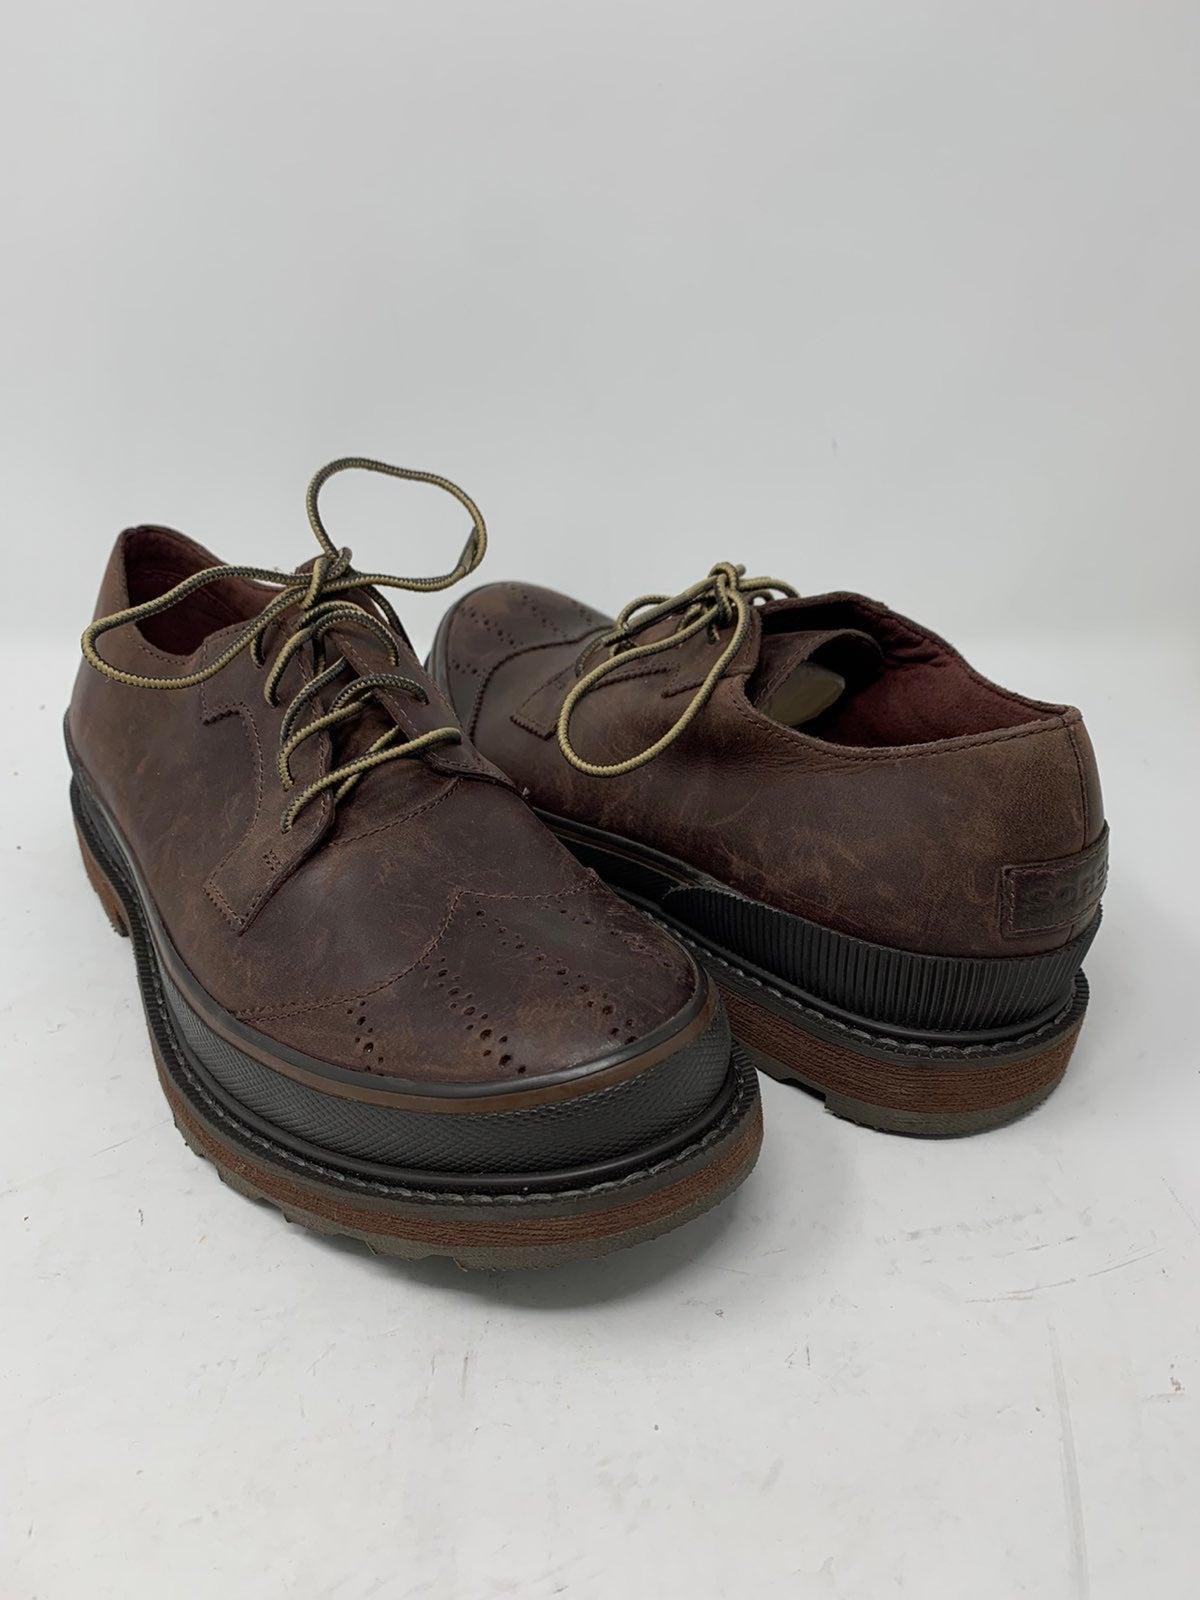 Mens Sorel Oxford Wingtip Dress Shoes 9